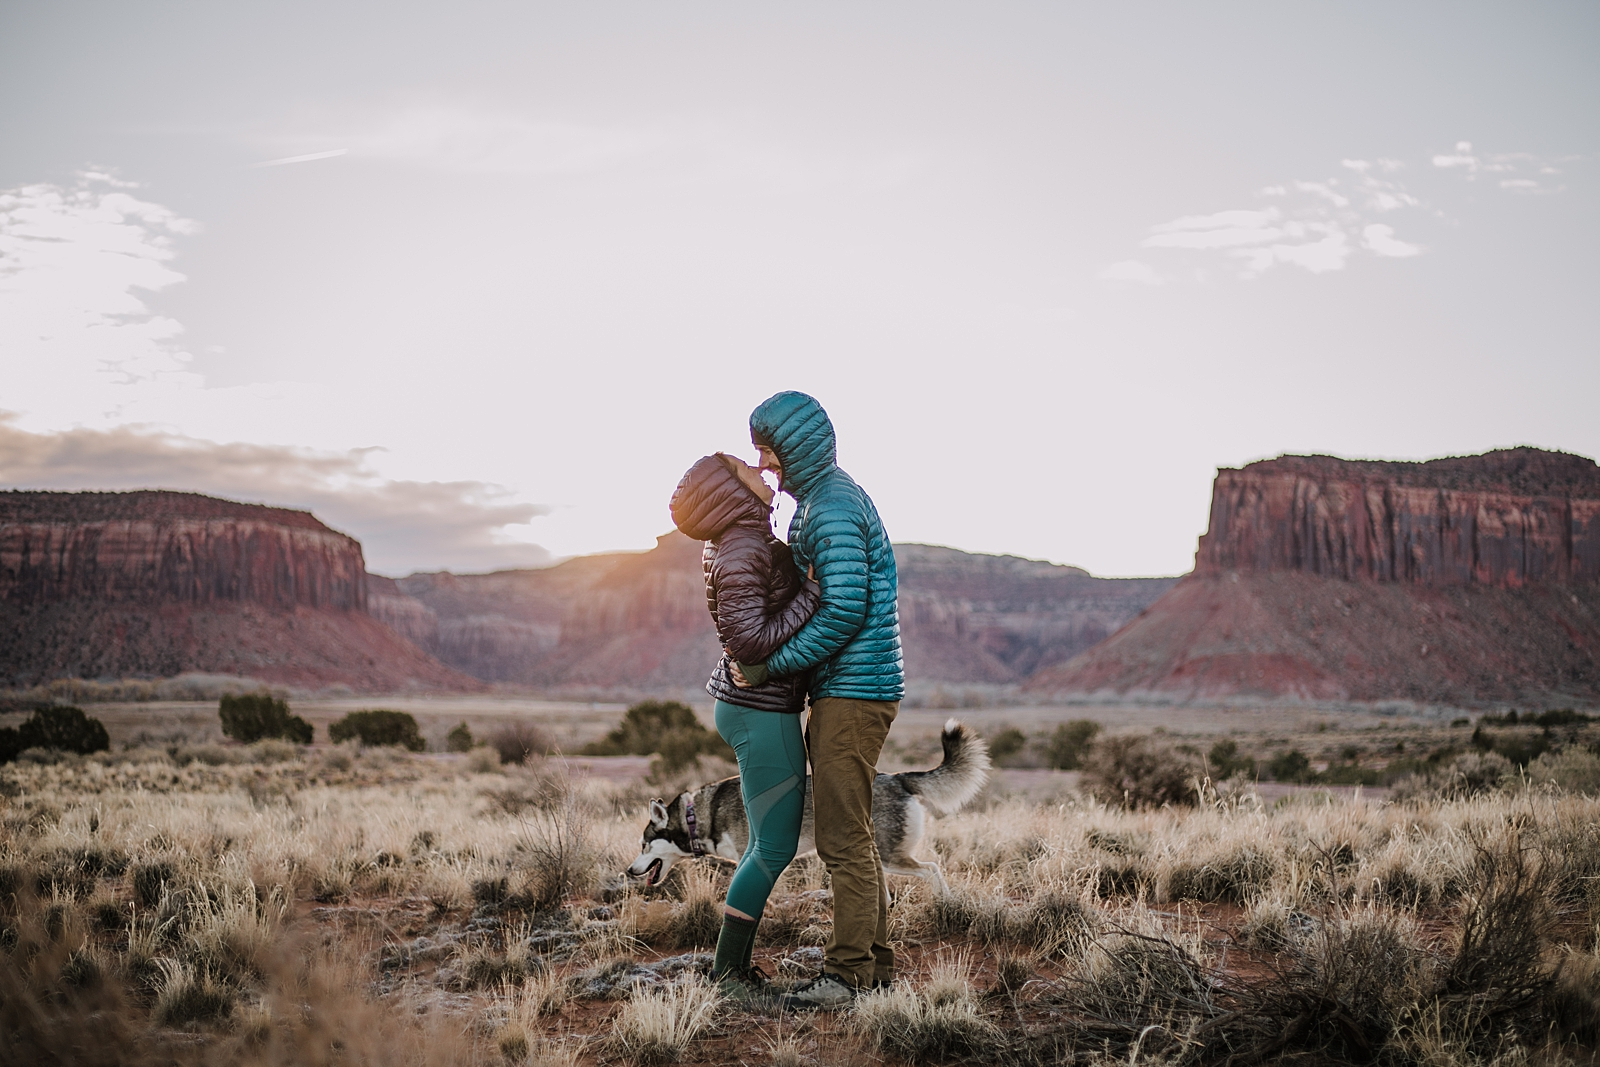 sunrise climbing in indian creek, moab utah, engagements, desert love, hiking in moab, hiking in indian creek, indian creek elopement